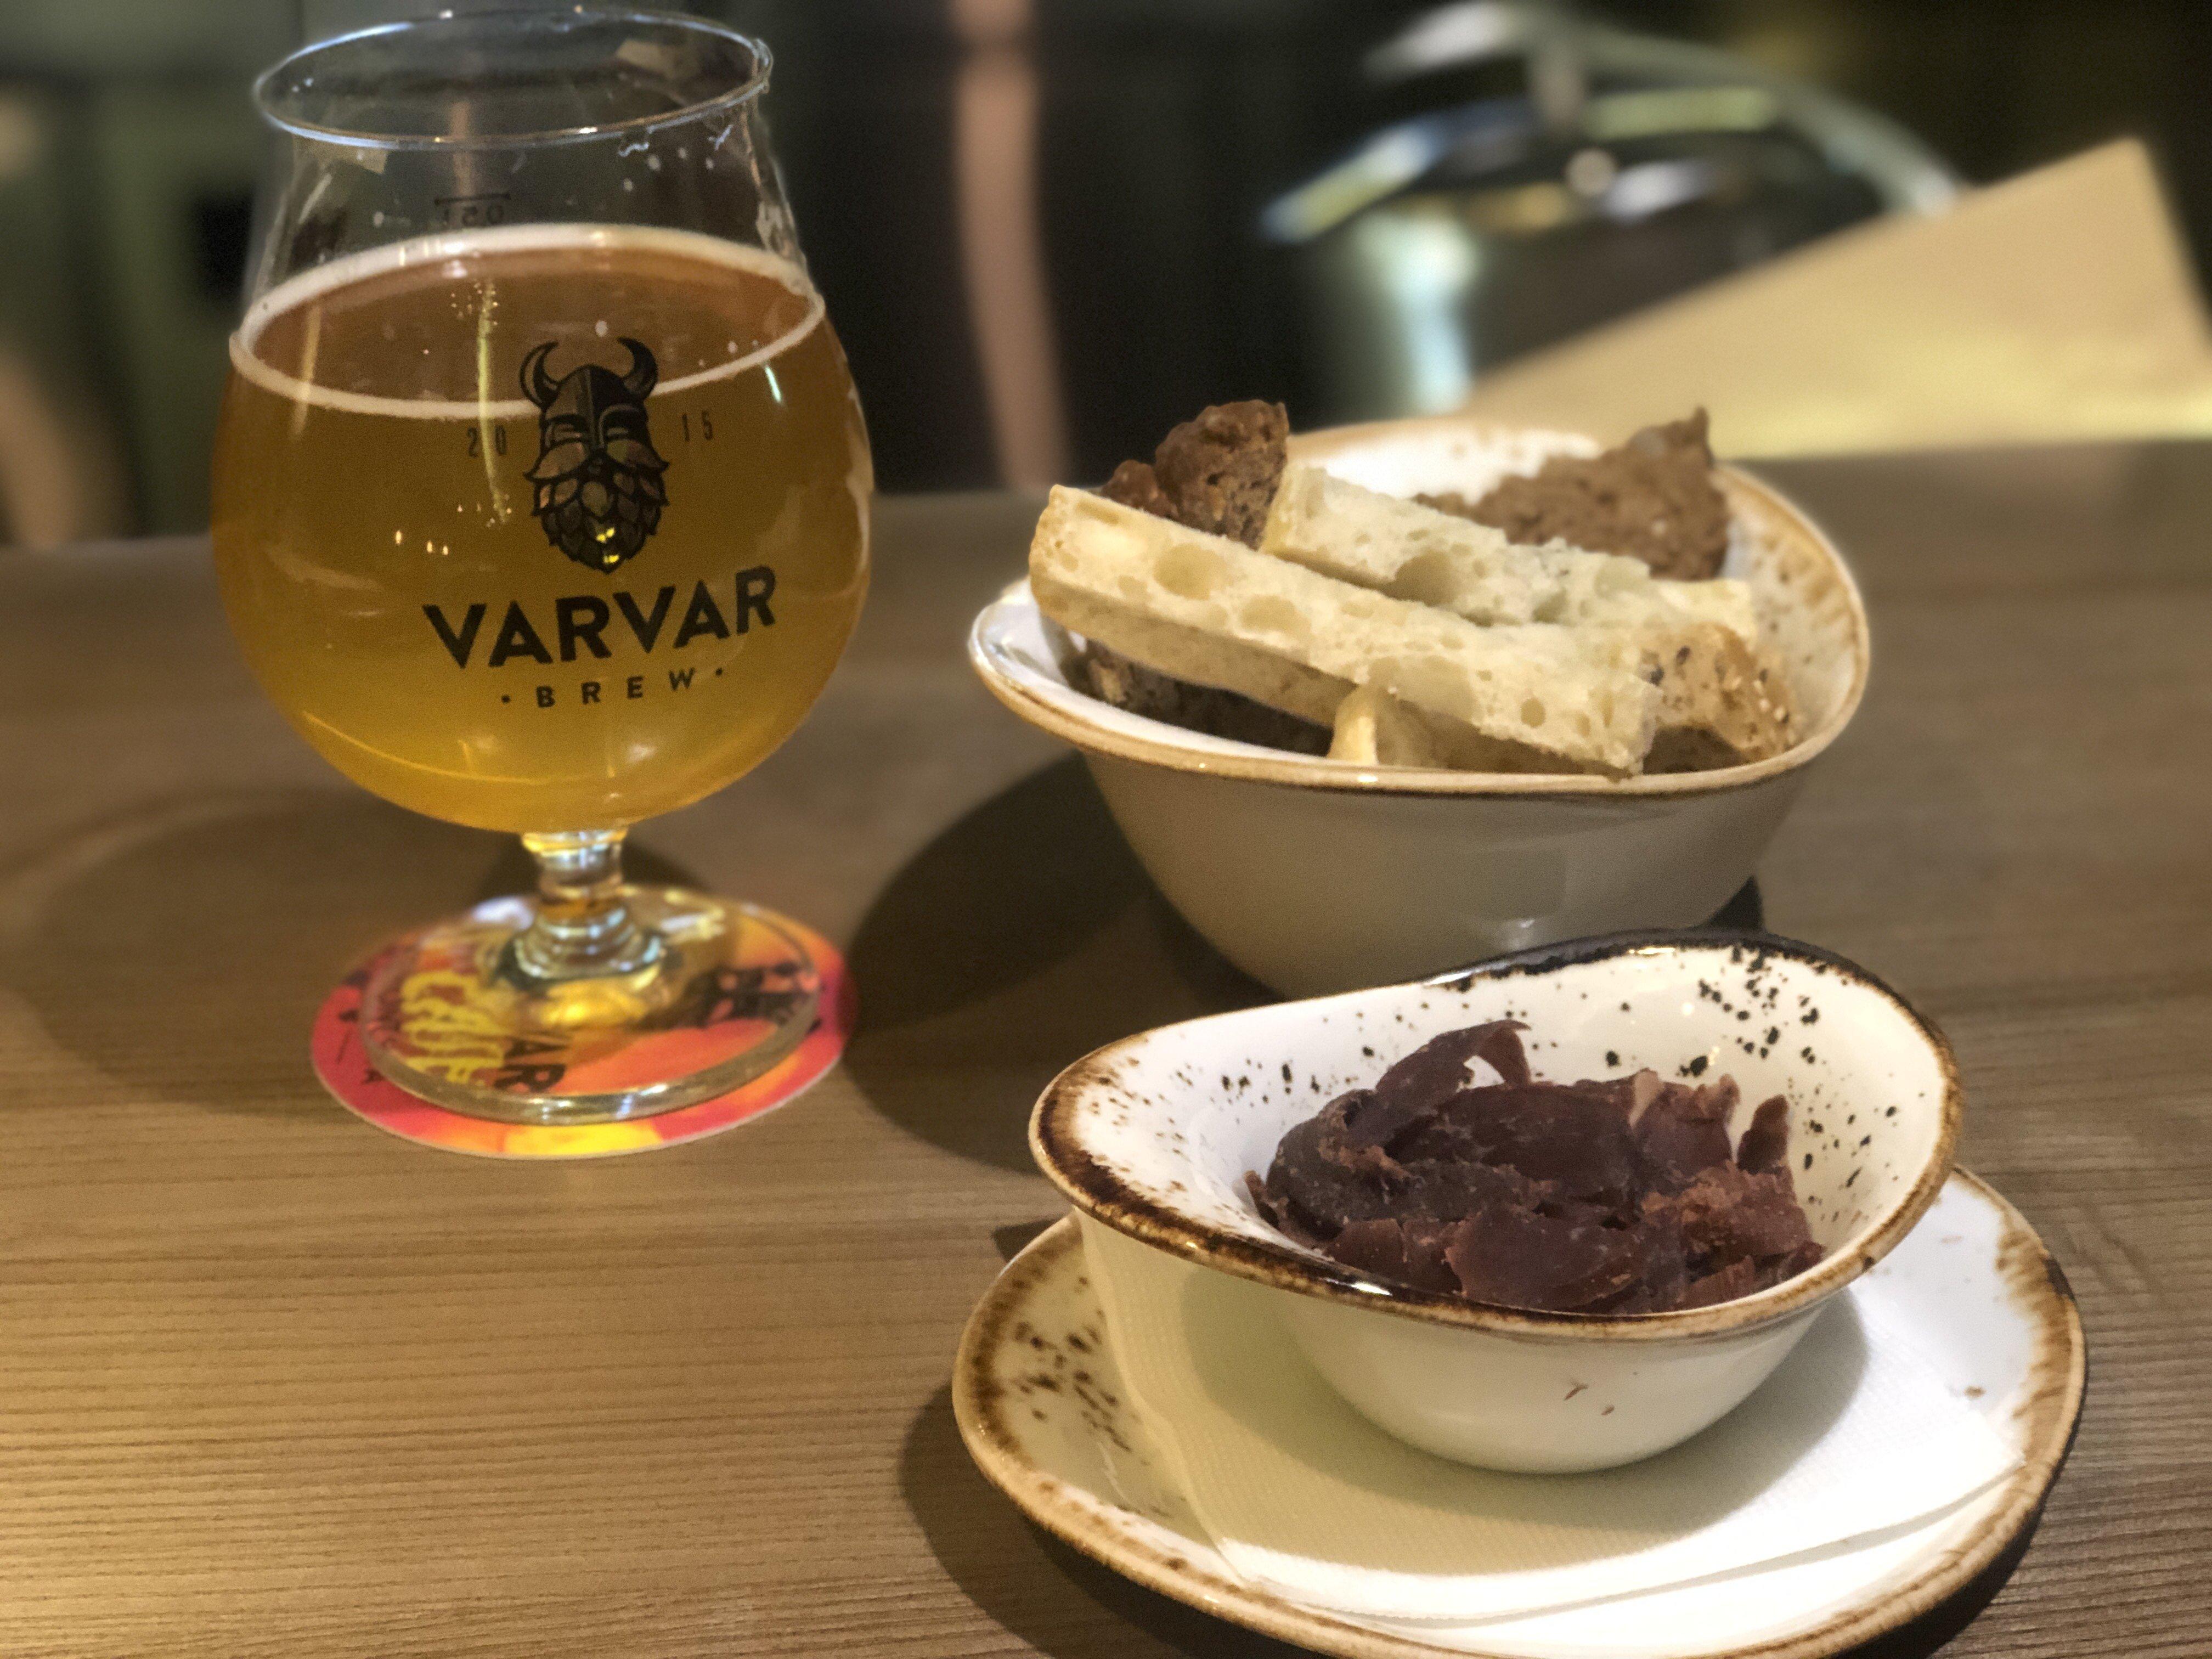 Varvar Ukrainian beer